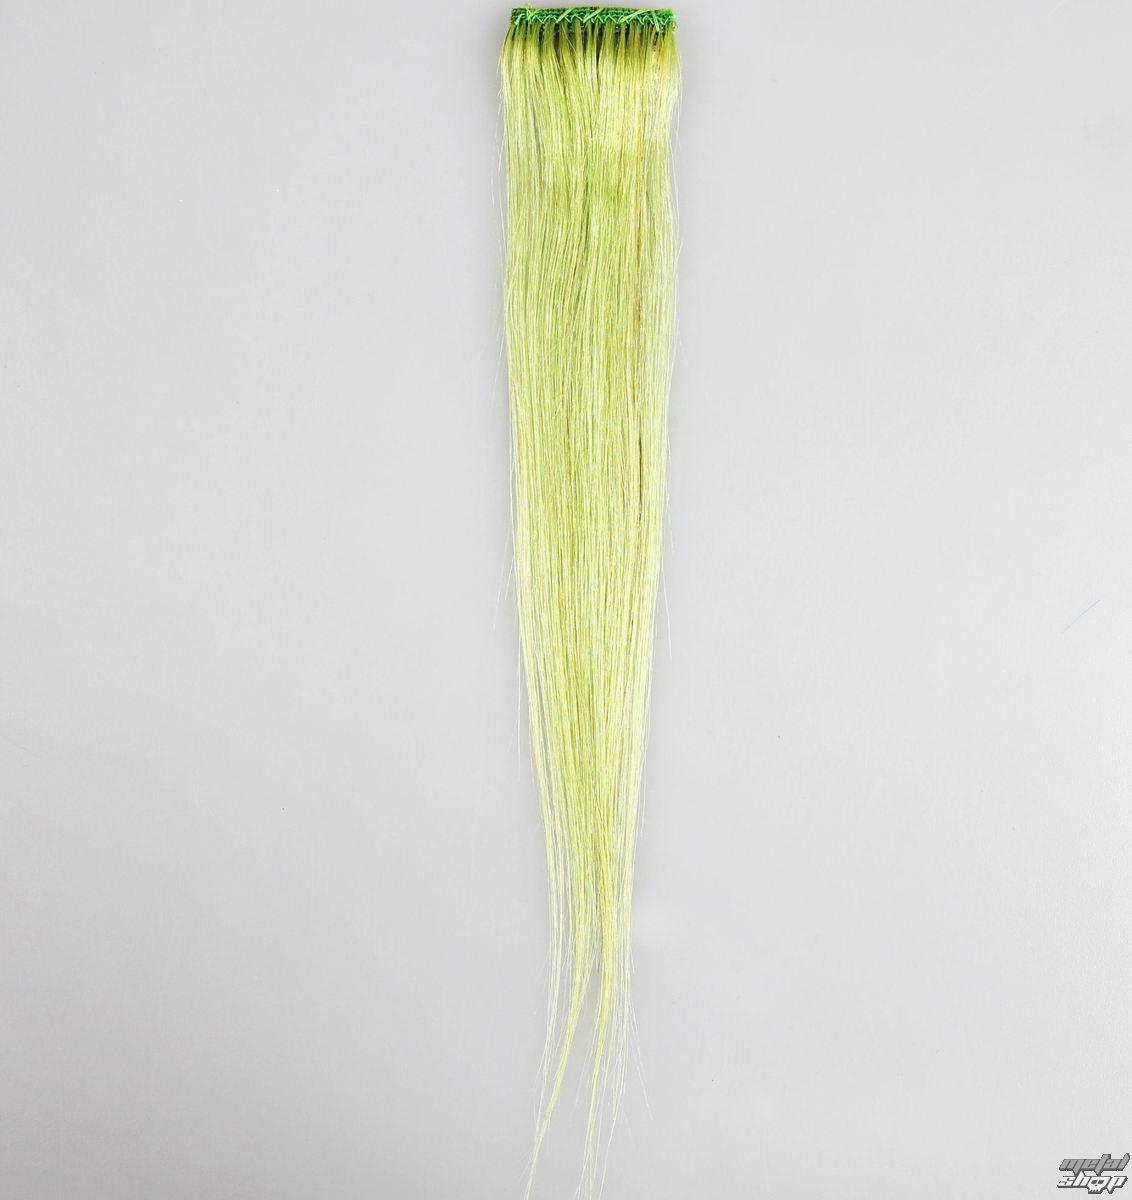 clip (príčesok) na vlasy MANIC PANIC - Human - Electric Lizard - 35901-178-C